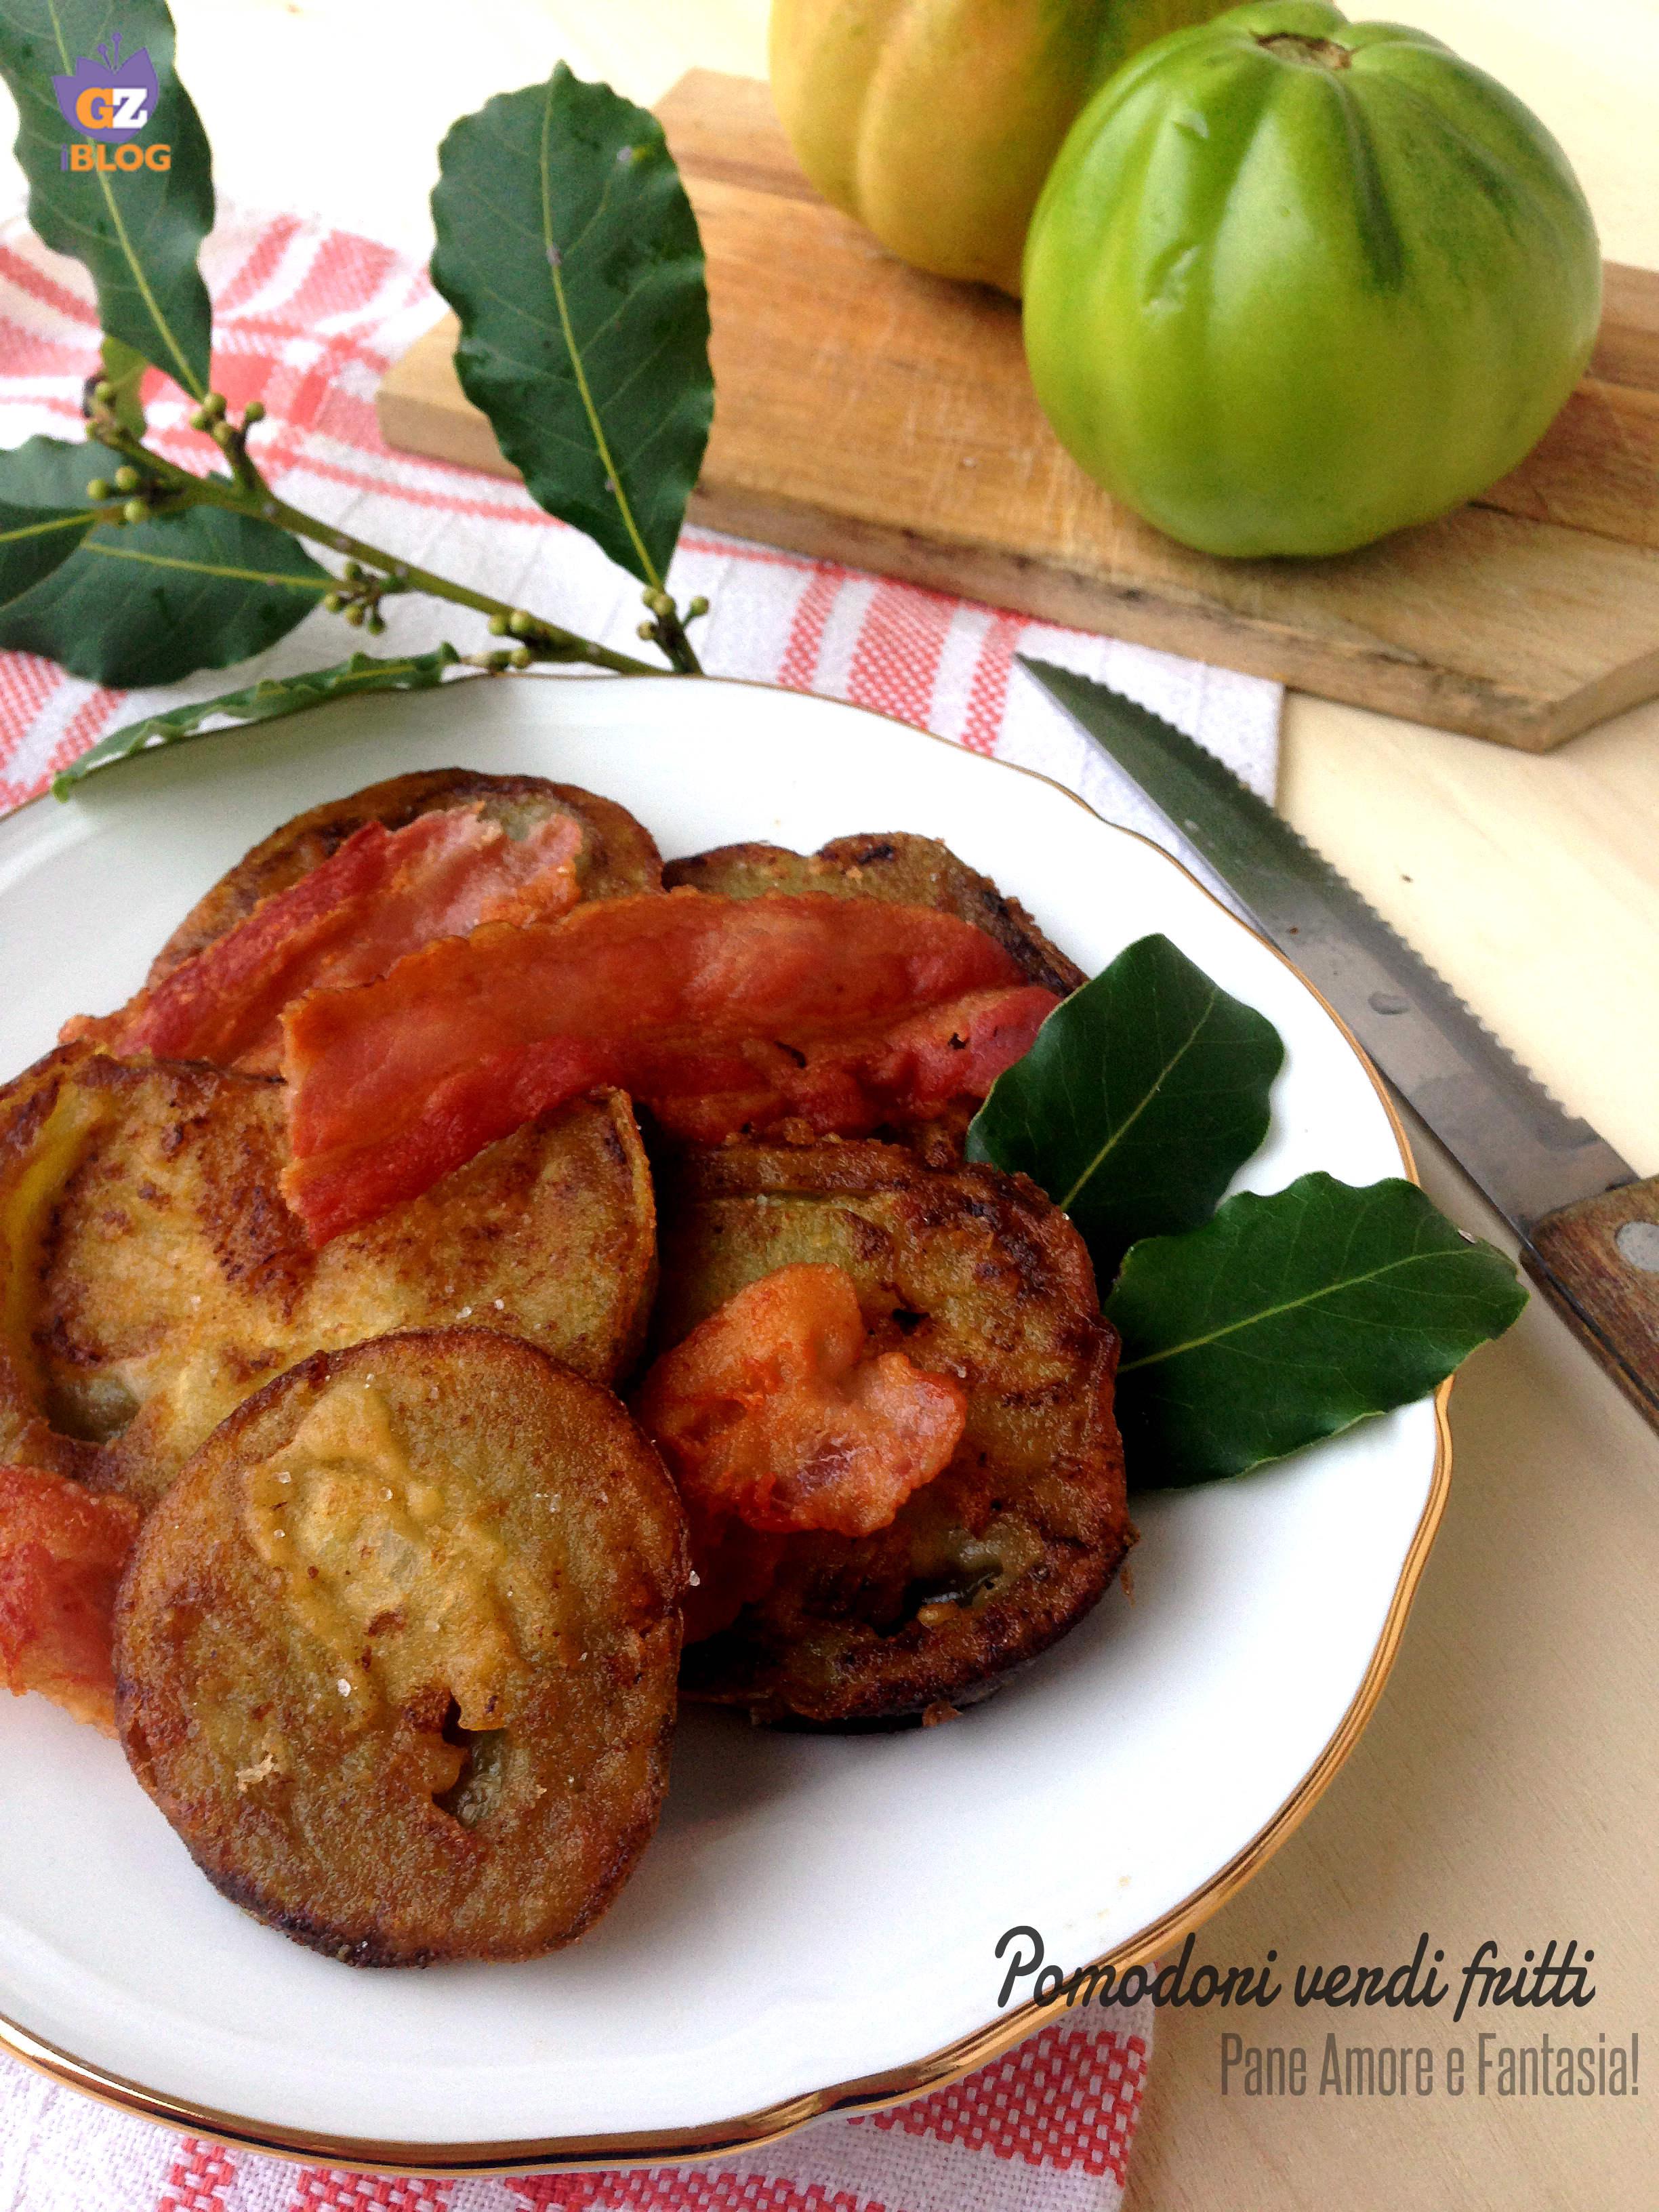 pomodori verdi fritti - photo #11